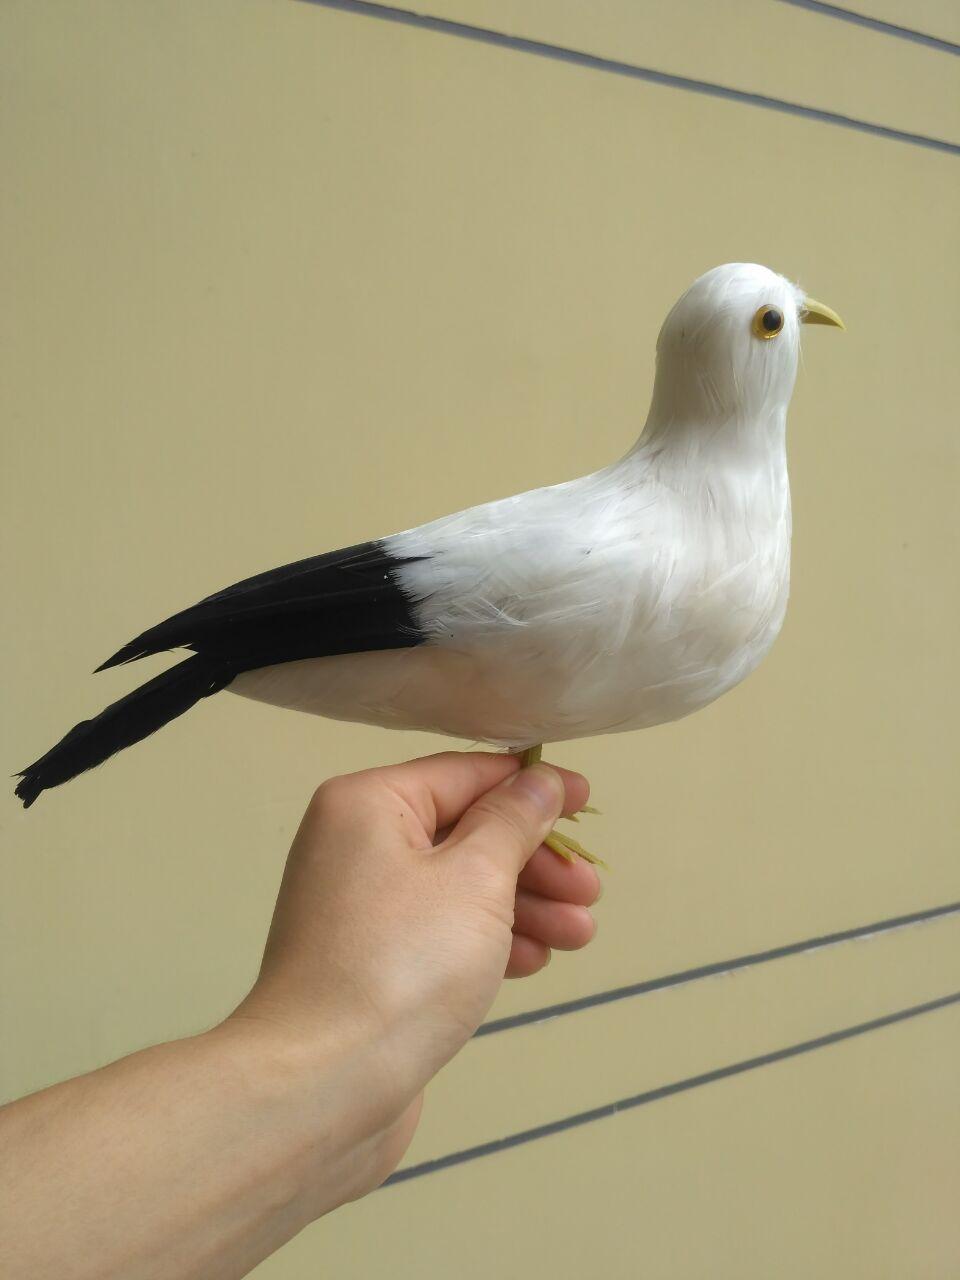 new big black&white simulation Seagull toy foam&fur seagull bird model about 30x20cm big sitting simulation white cat model plastic